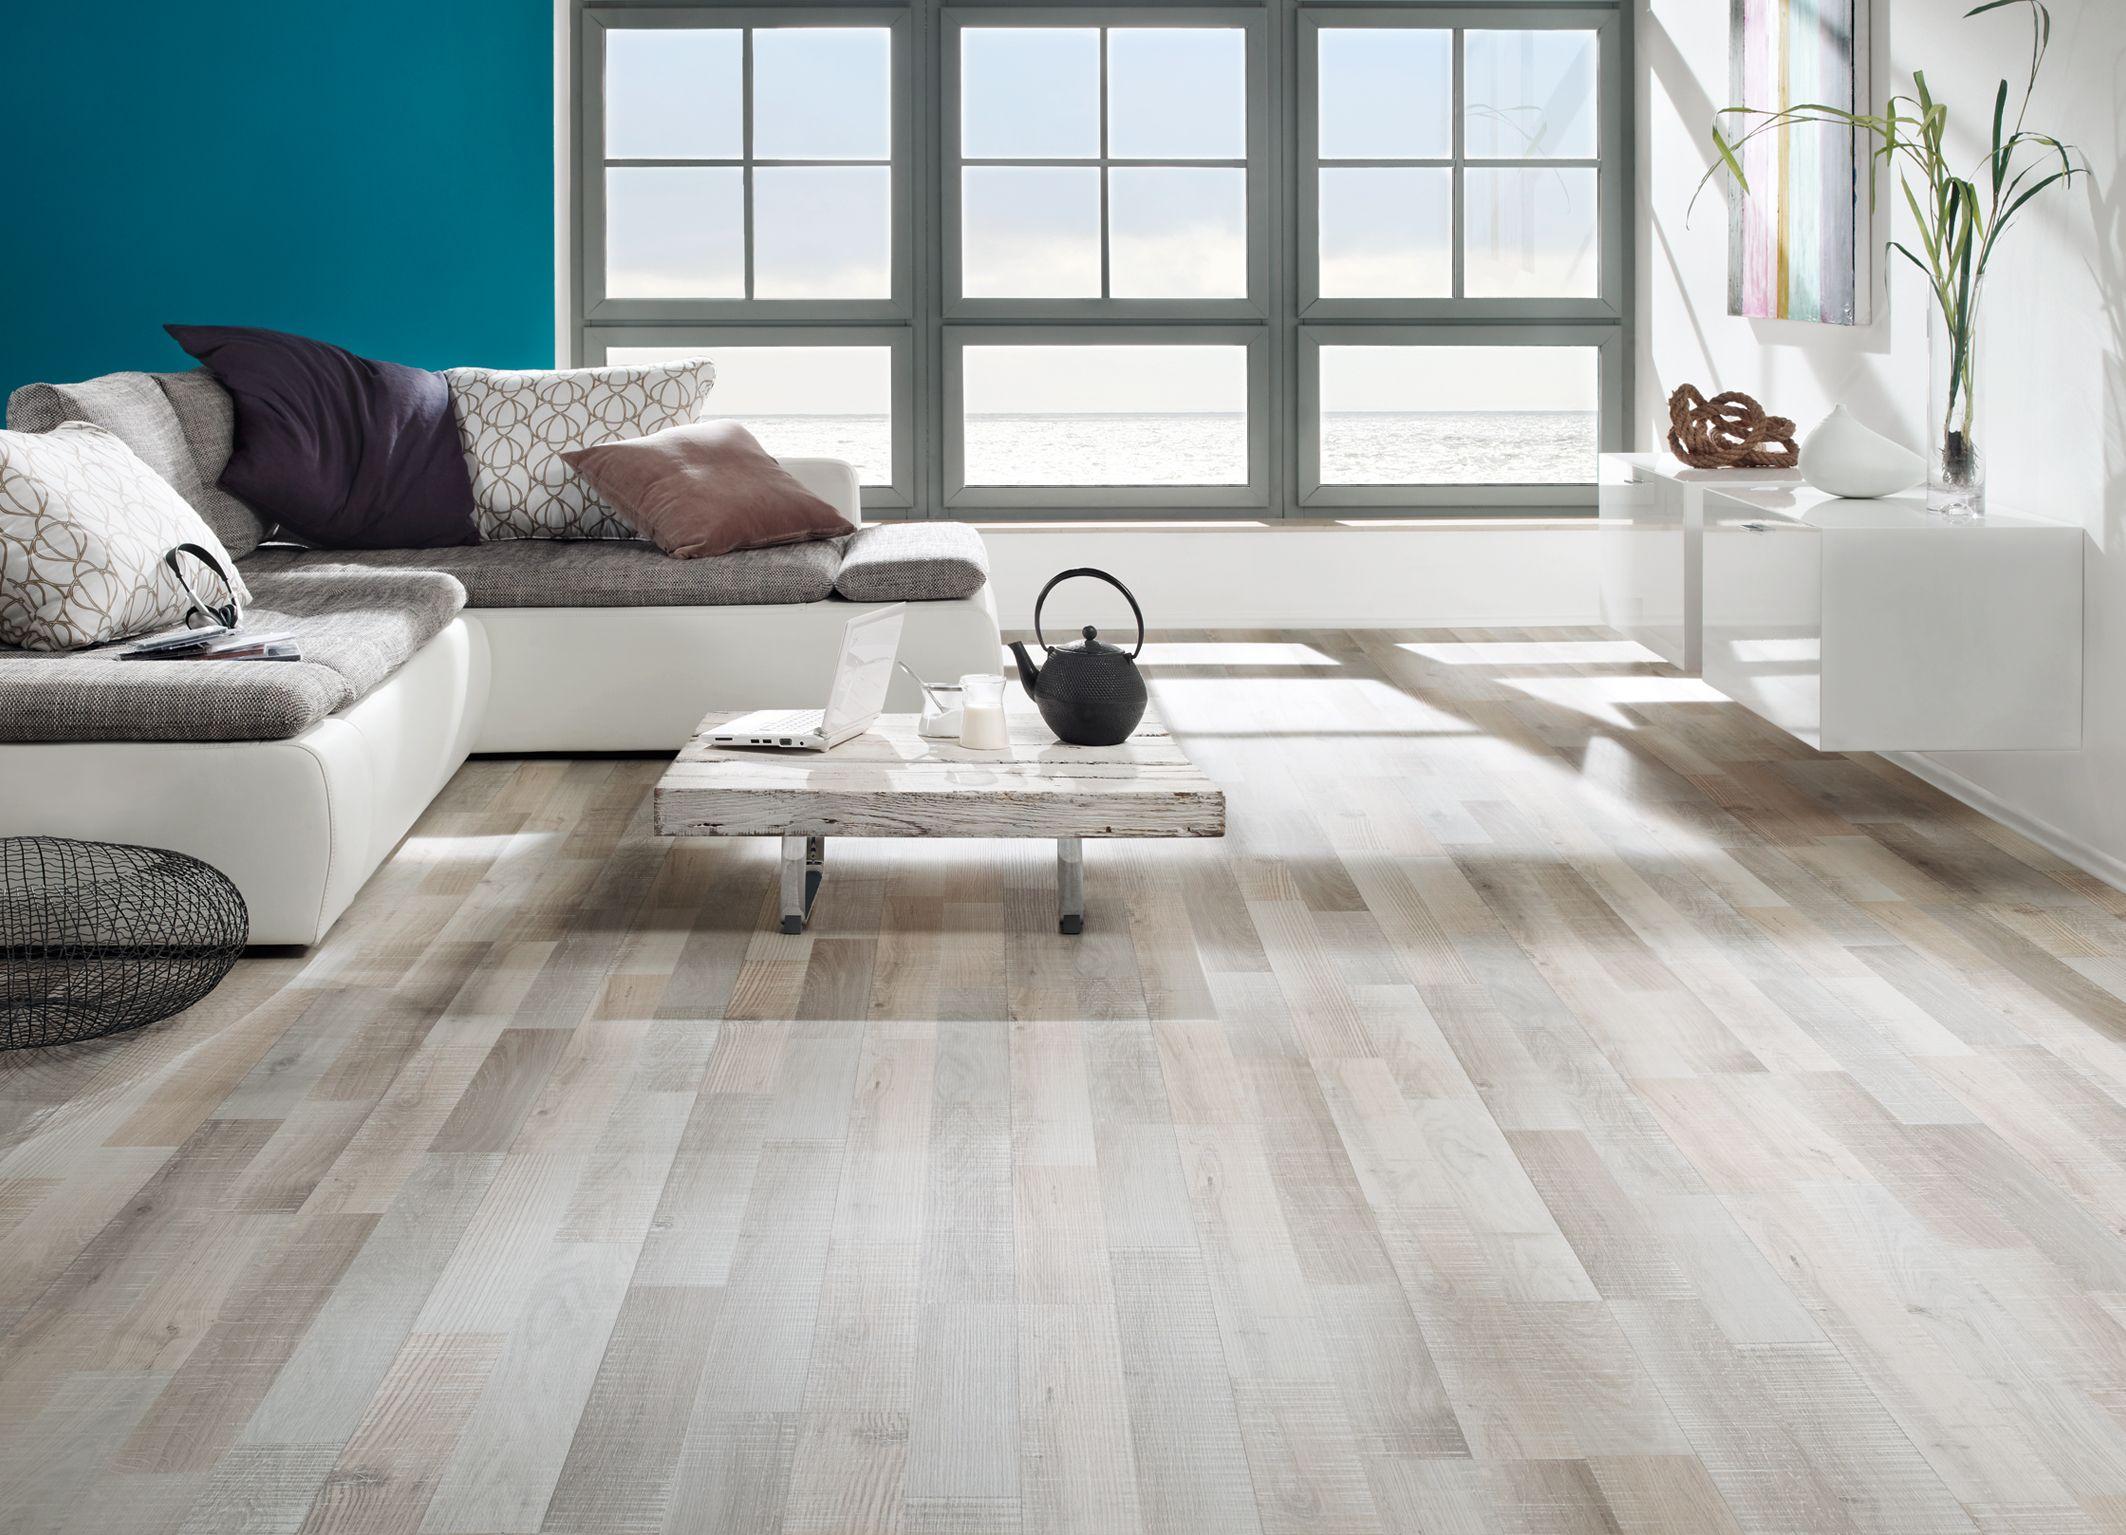 Eiken ruw gezaagd grijs wit laminaat vloer vloer